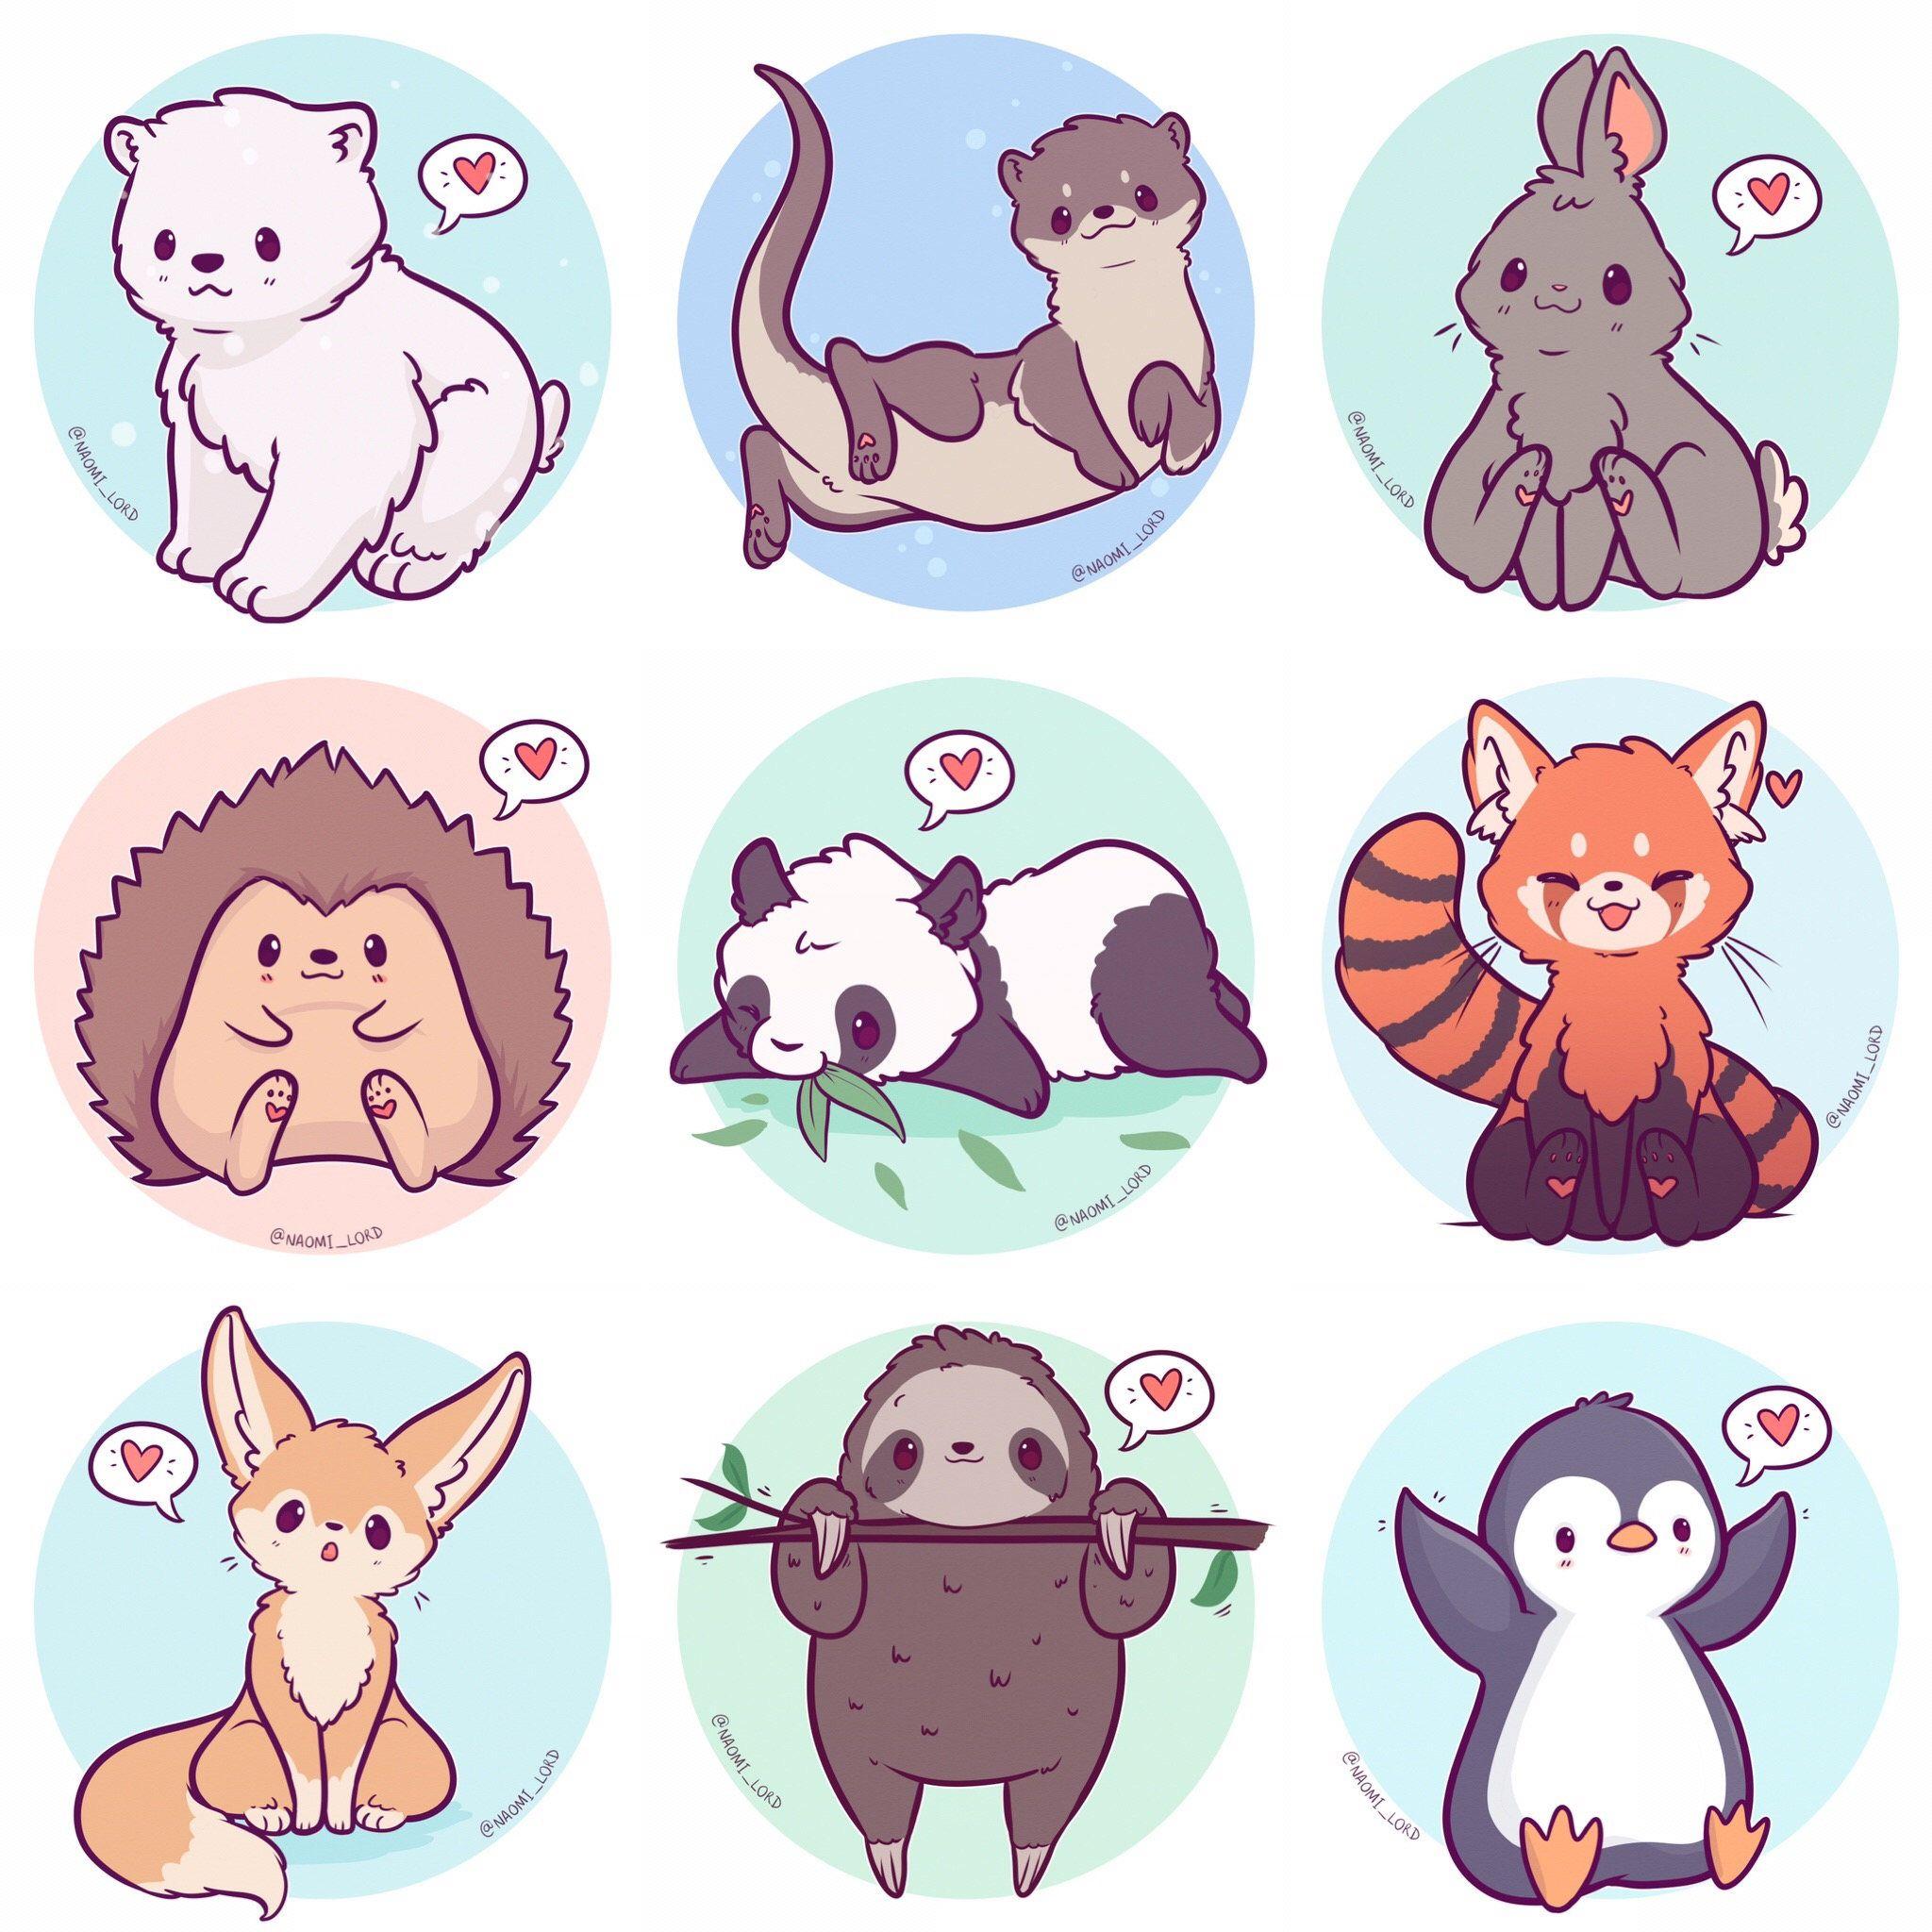 Kawaii Animals Stickers, Owl, Snow Leopard, Shiba, Fox, Husky, Peacock, Corgi, sloth, fennec, penguin, red panda, and more :3